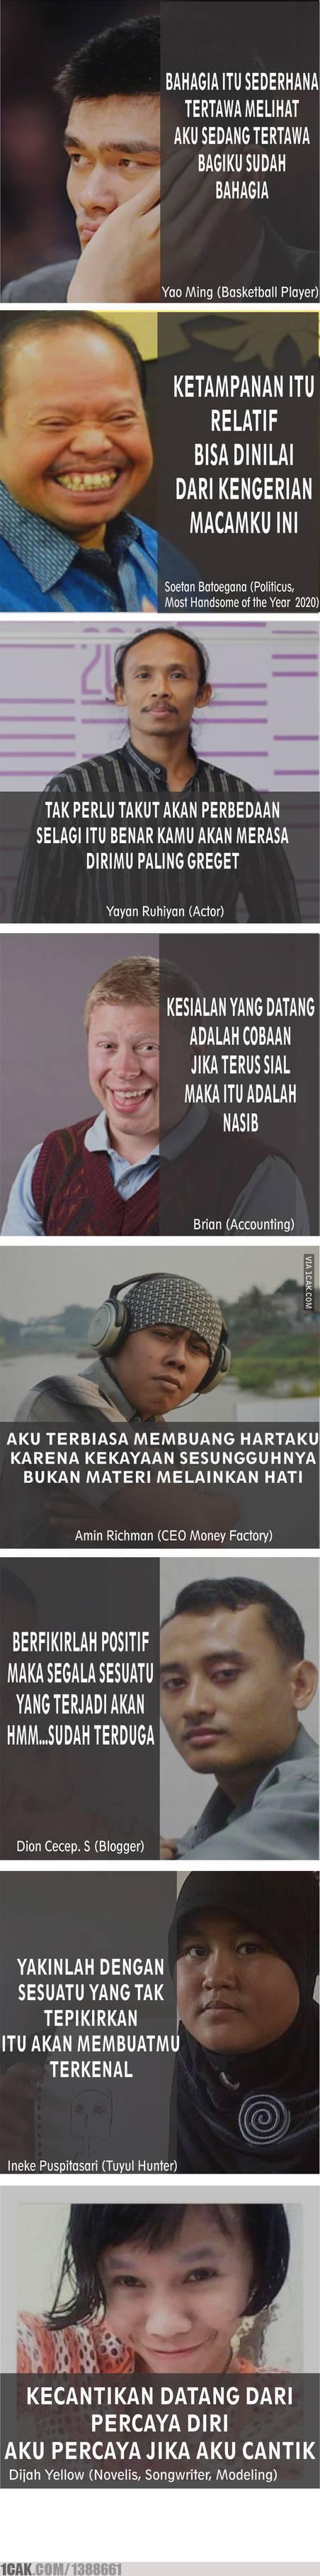 Download Kumpulan 74 Meme Uang Sial Terunik